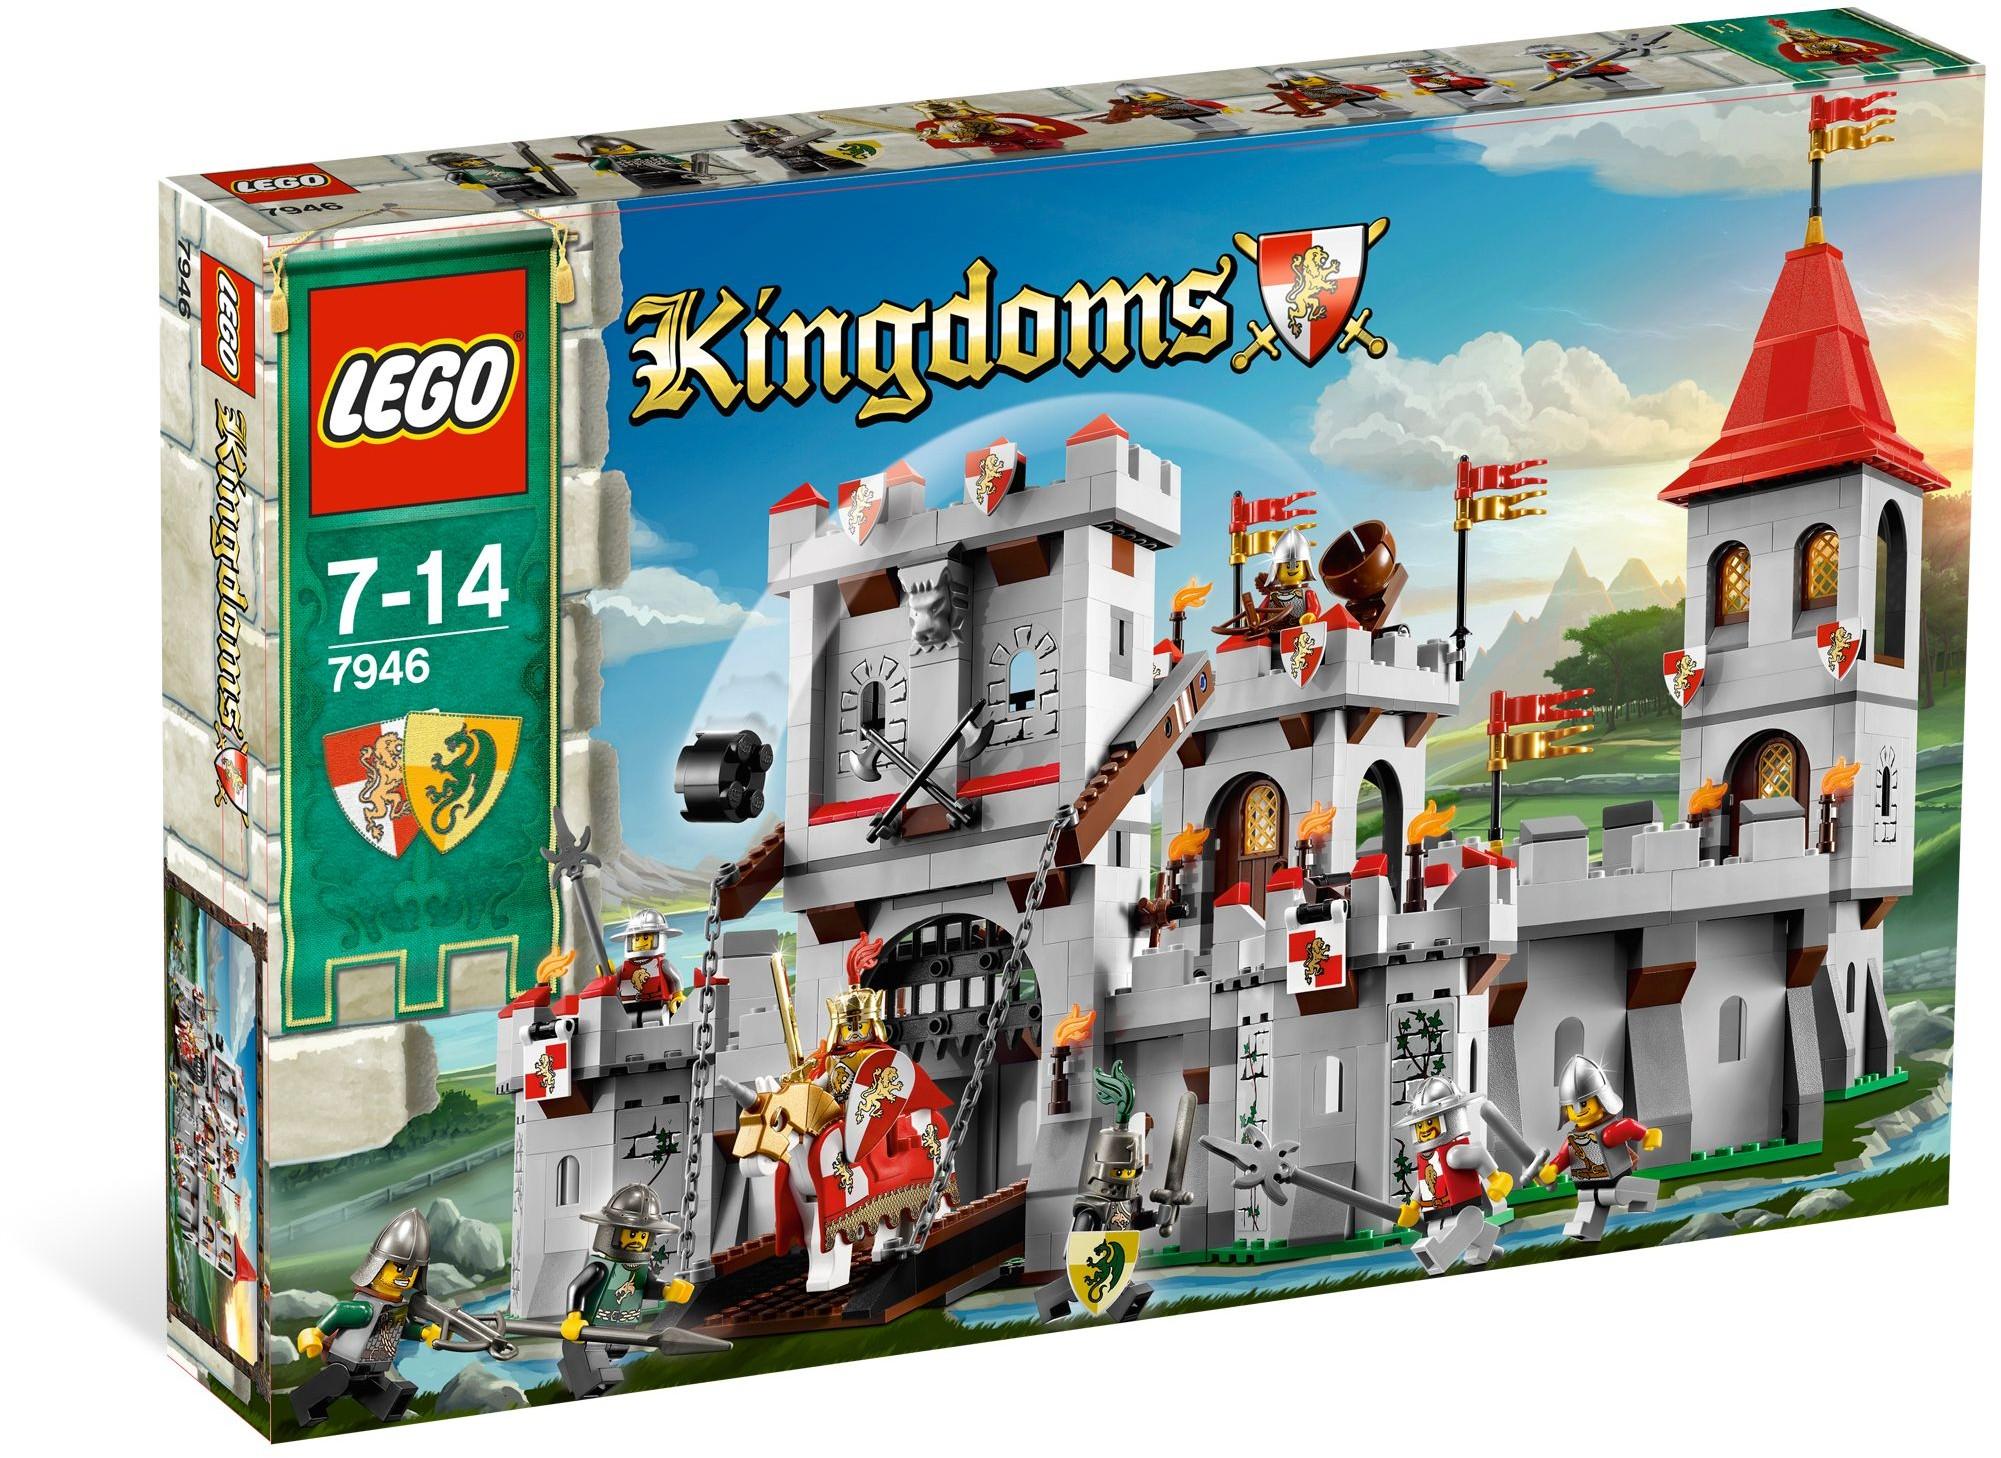 lego-kingdoms-7946-2010 zusammengebaut.com